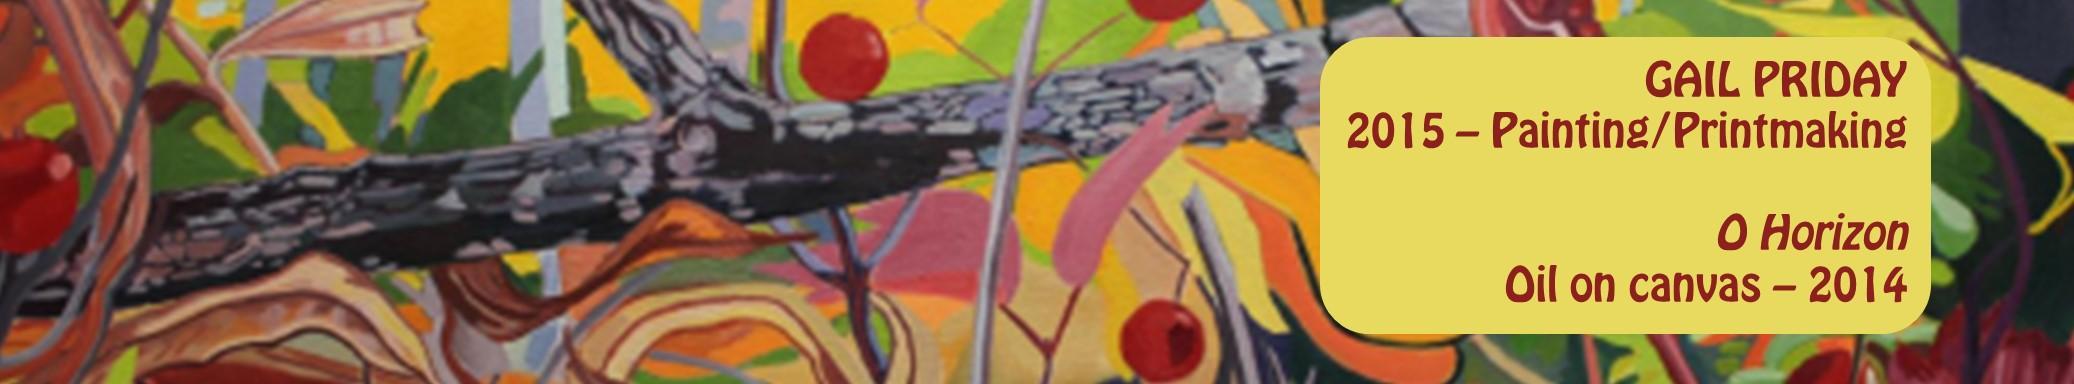 Gail Priday - Painting, printmaking - O Horizon - oil on canvas - 2014